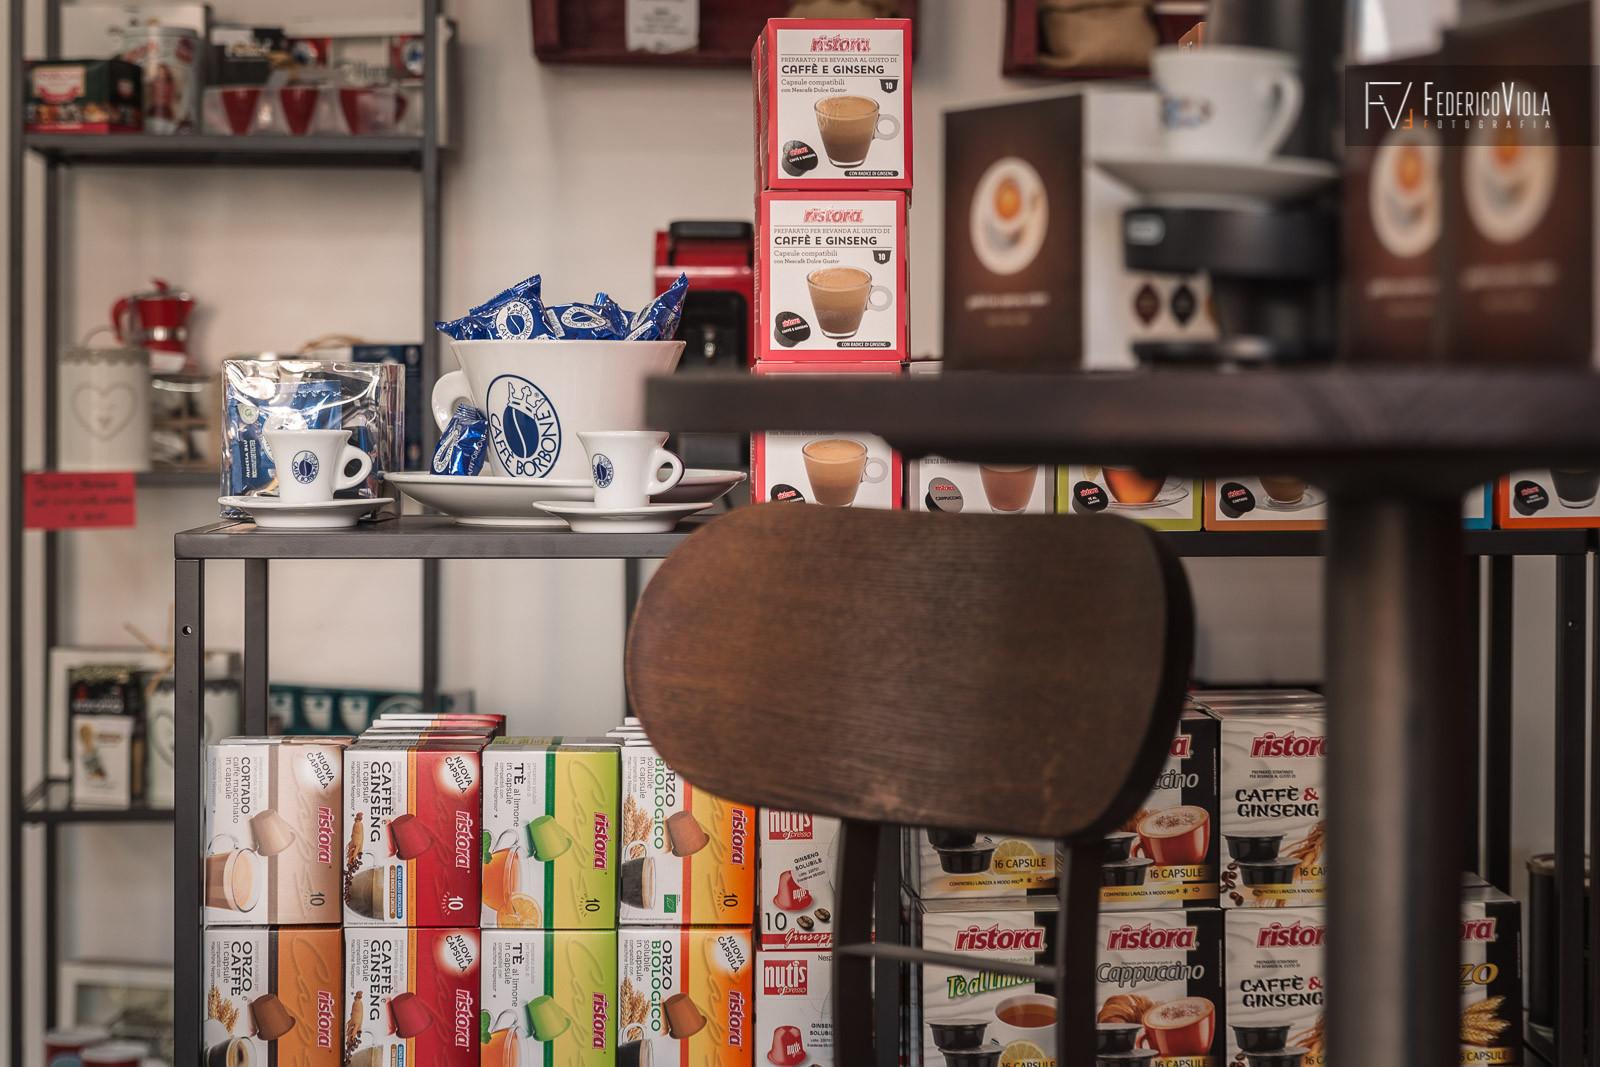 Foto-negozio-Coffee-System-Fondi-Federico-Viola-Fotografia-9